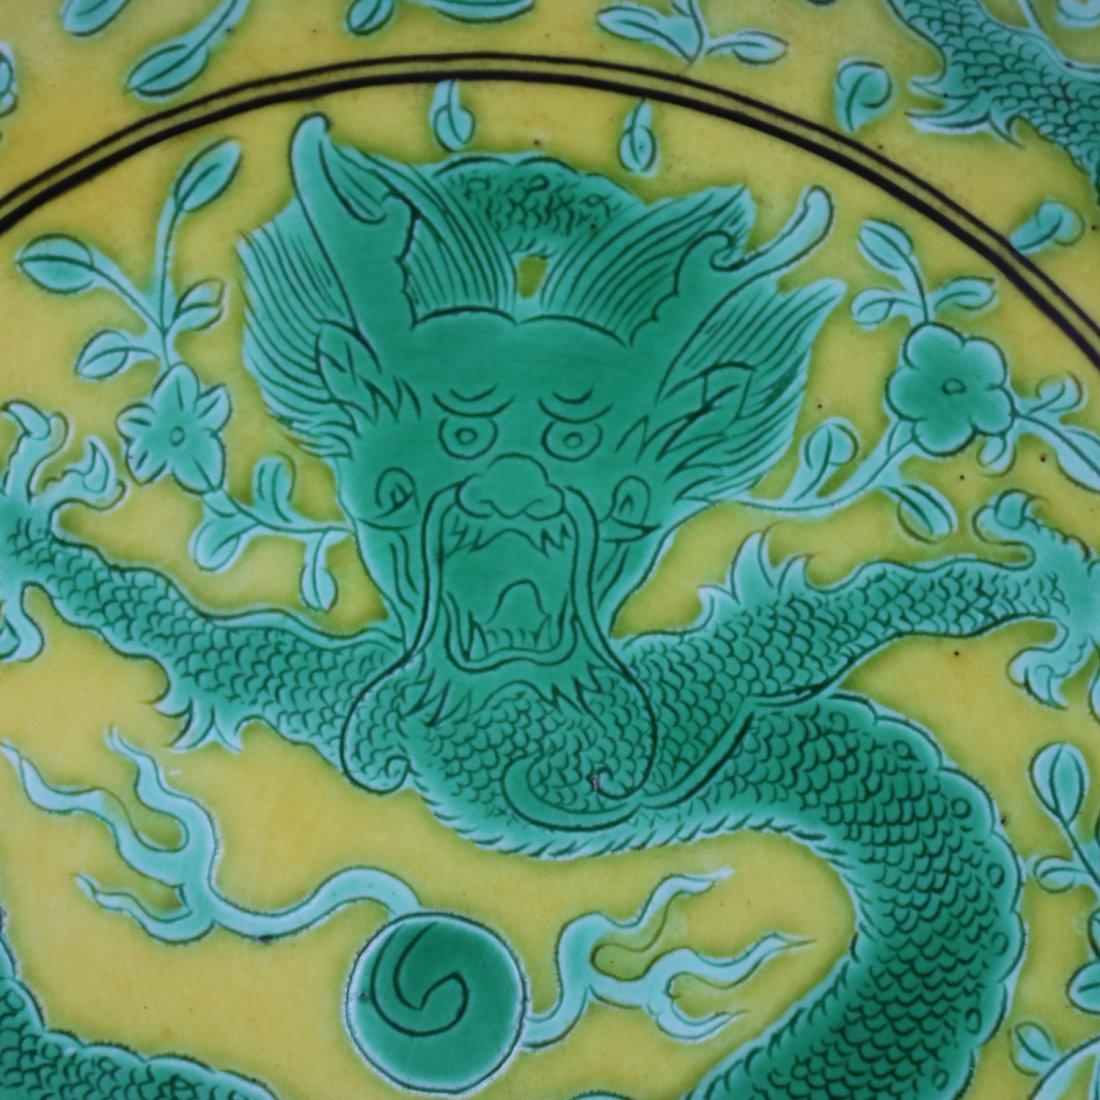 Chinese Yellow glaze green dragon Porcelain Plate - 5